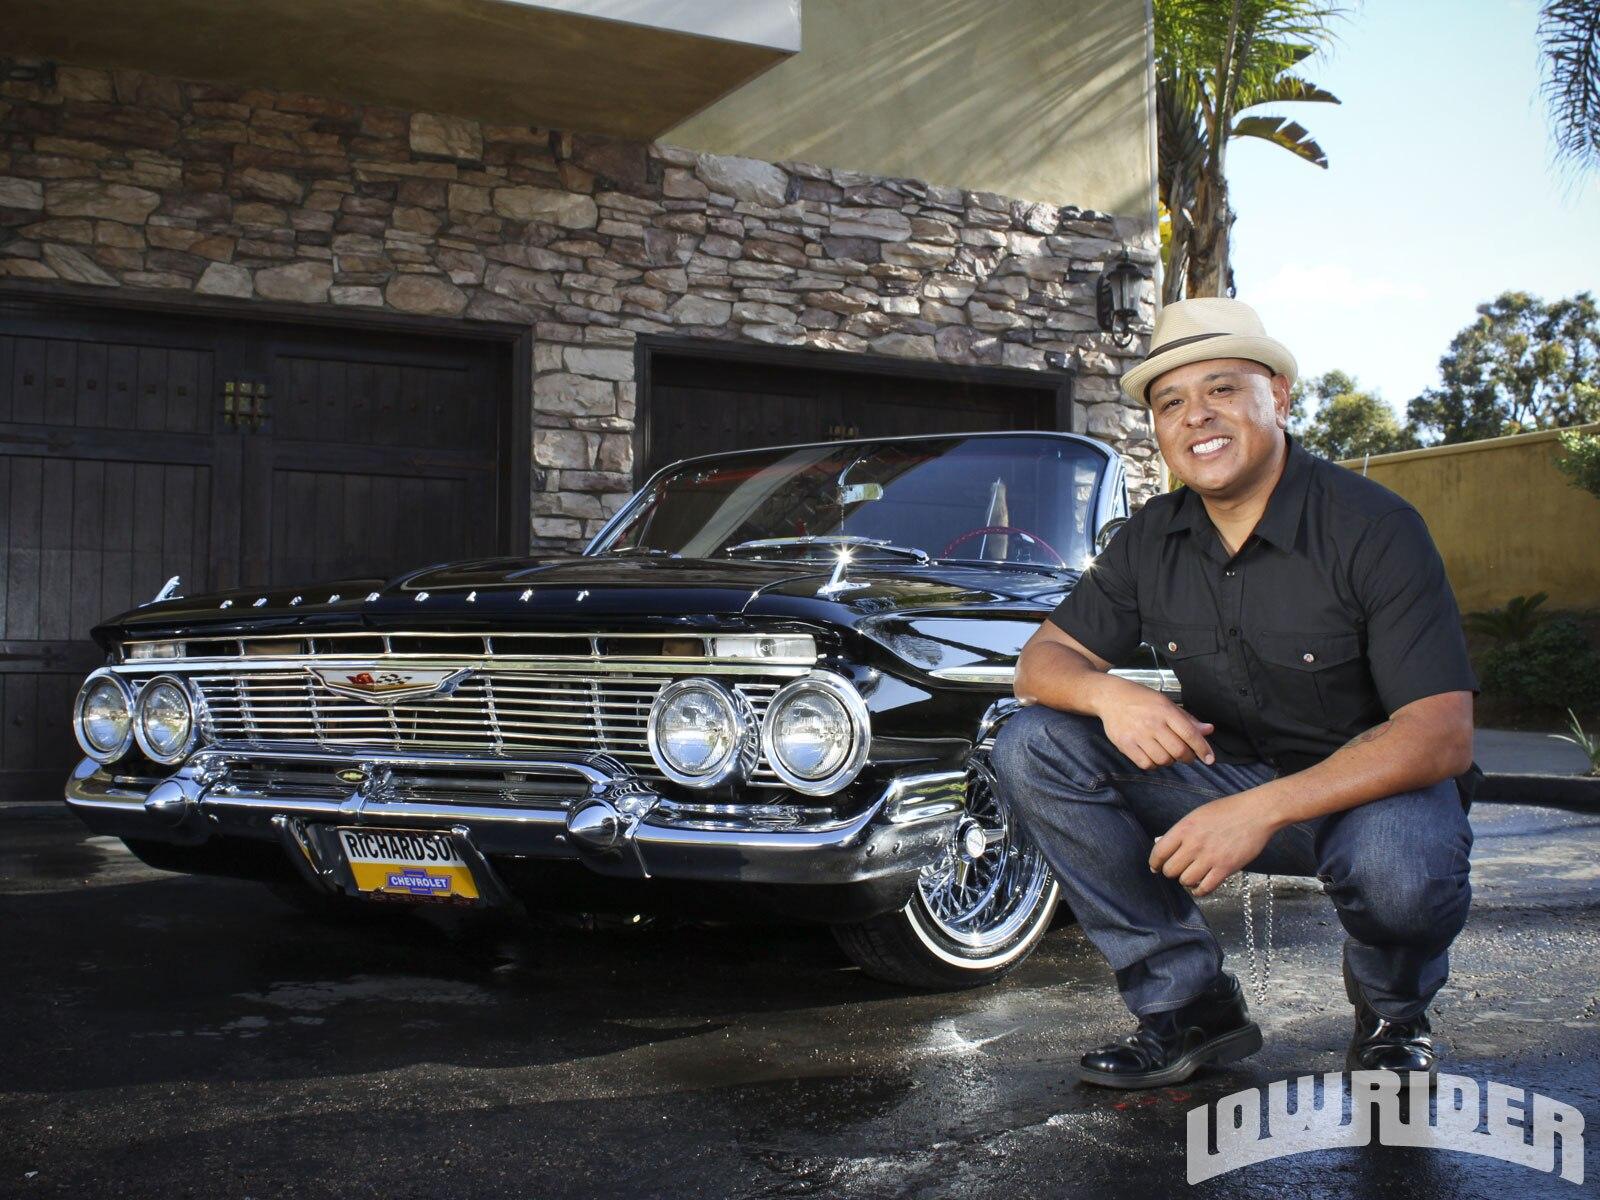 1110-lrmp-12-o-1961-chevrolet-impala-ragtop-x-man.JPG2